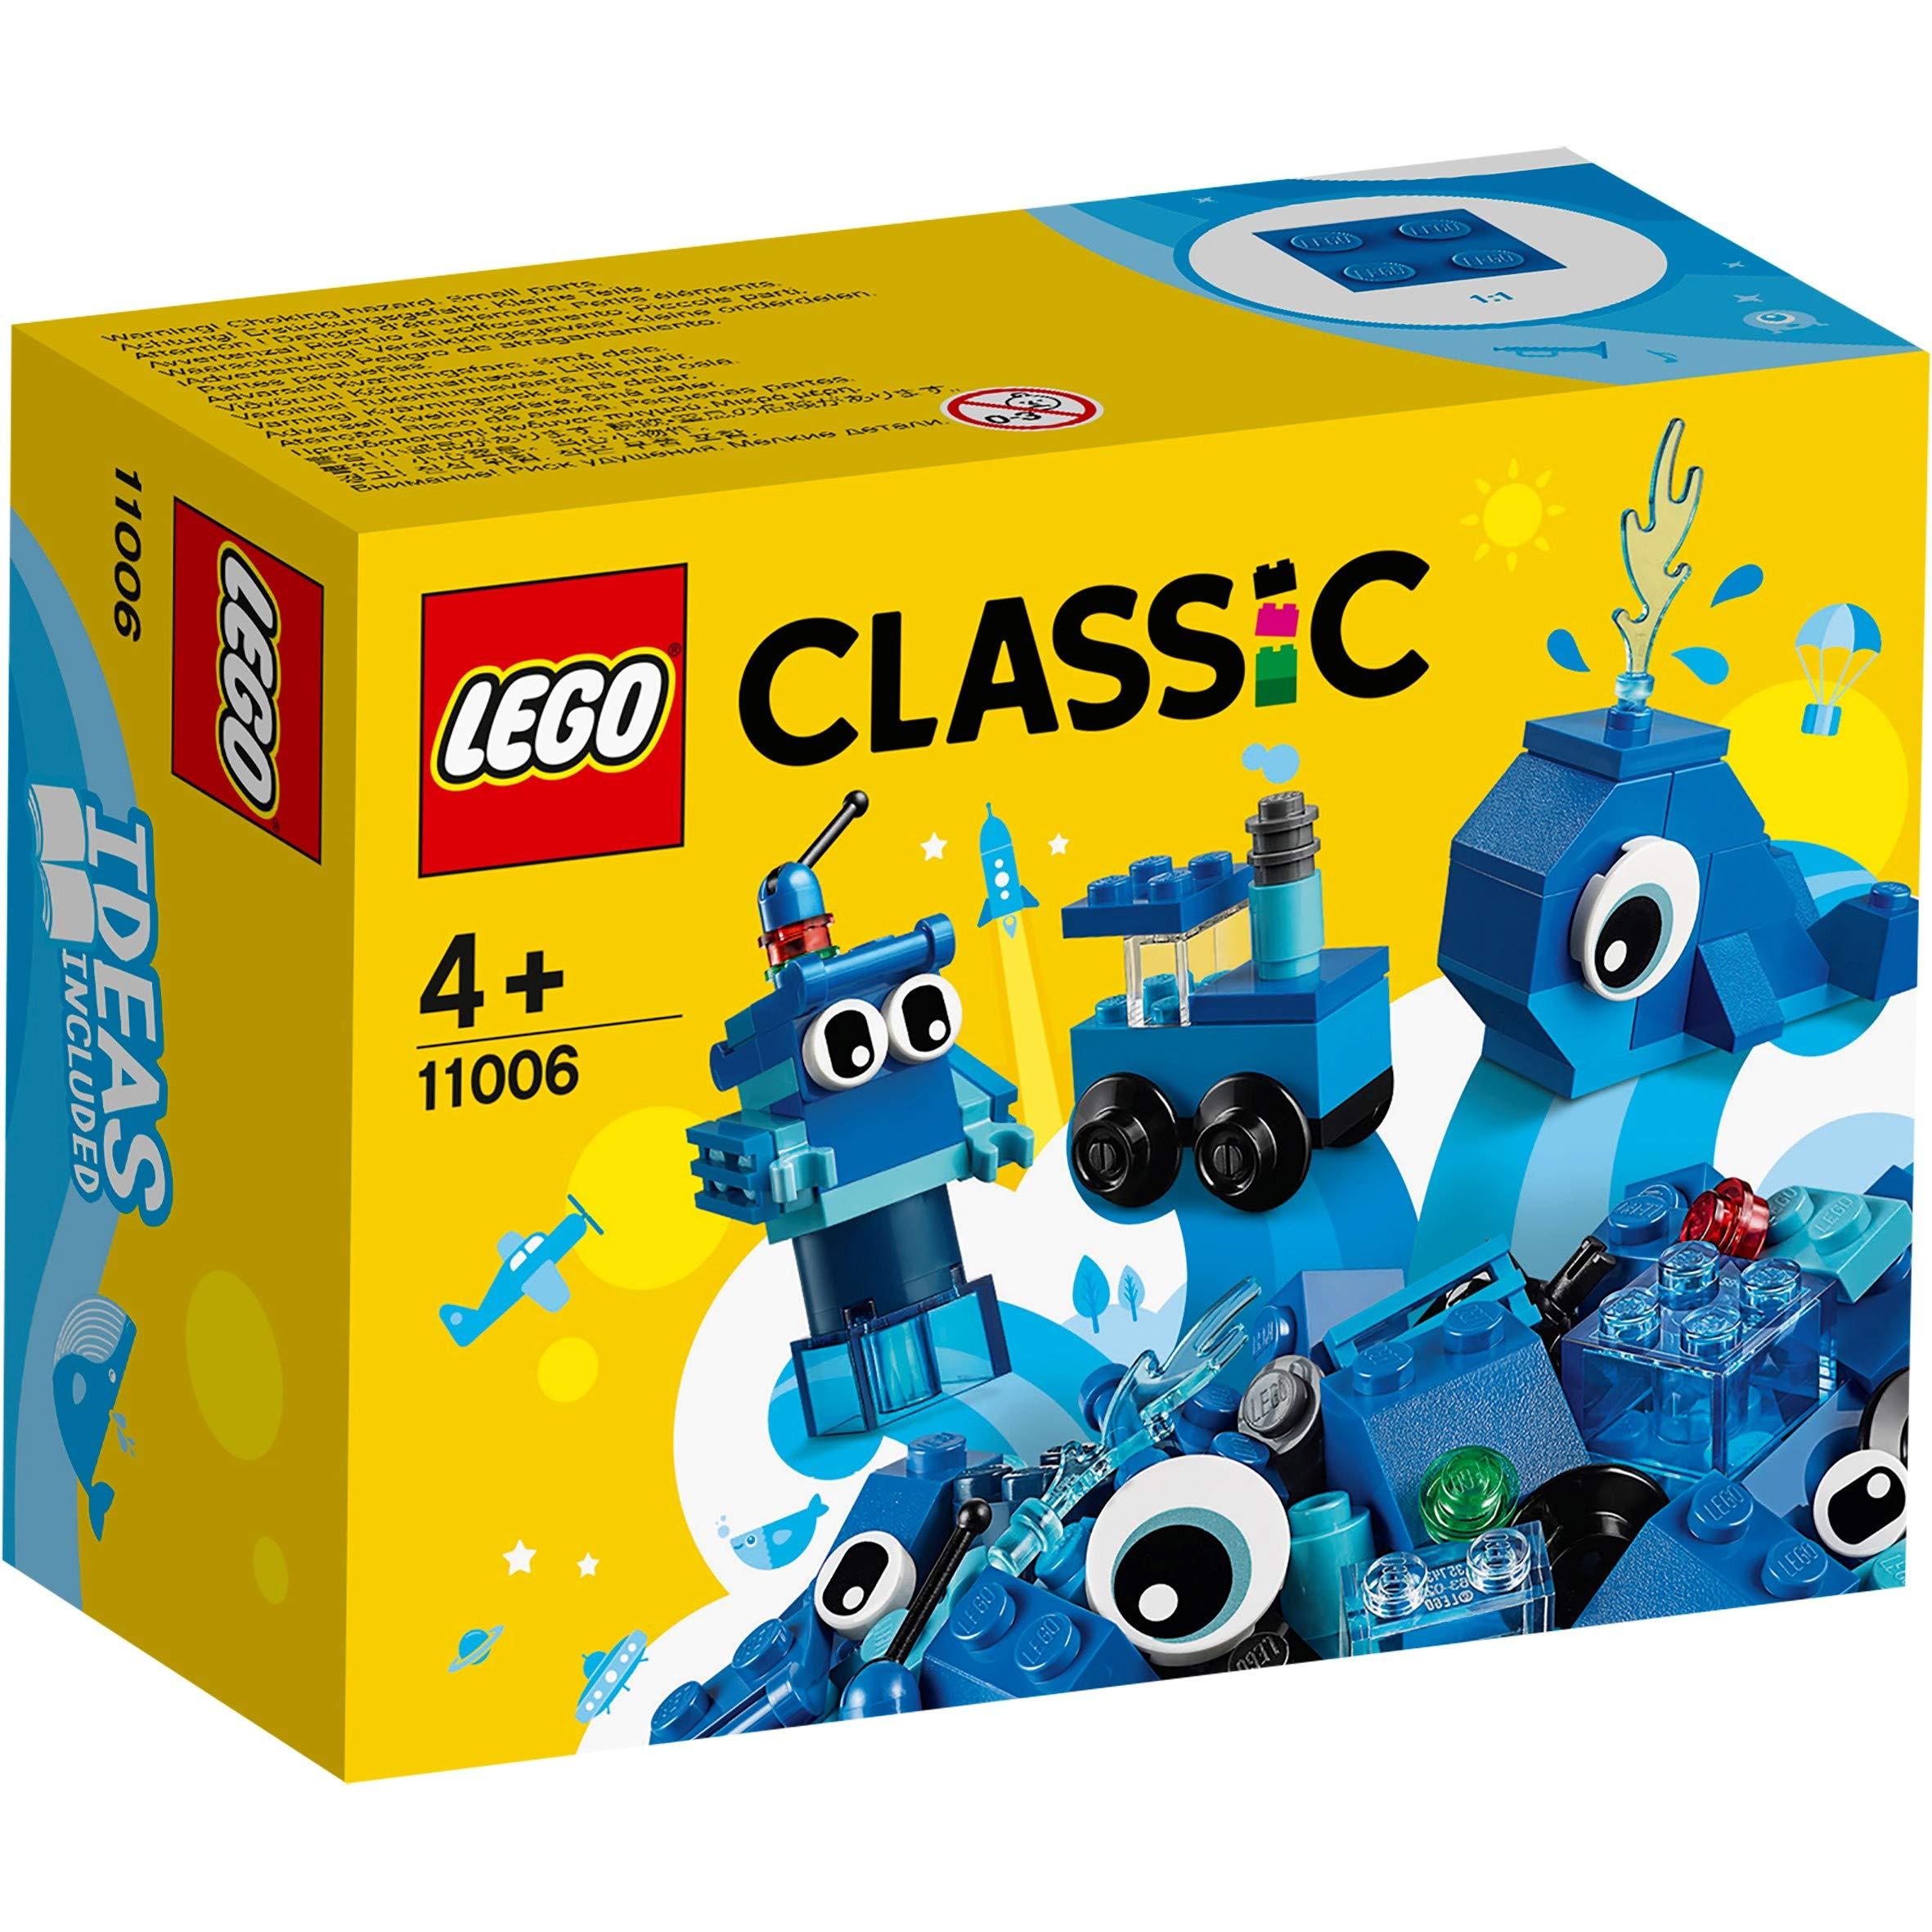 Amazon.it: LEGO: LEGO Classic